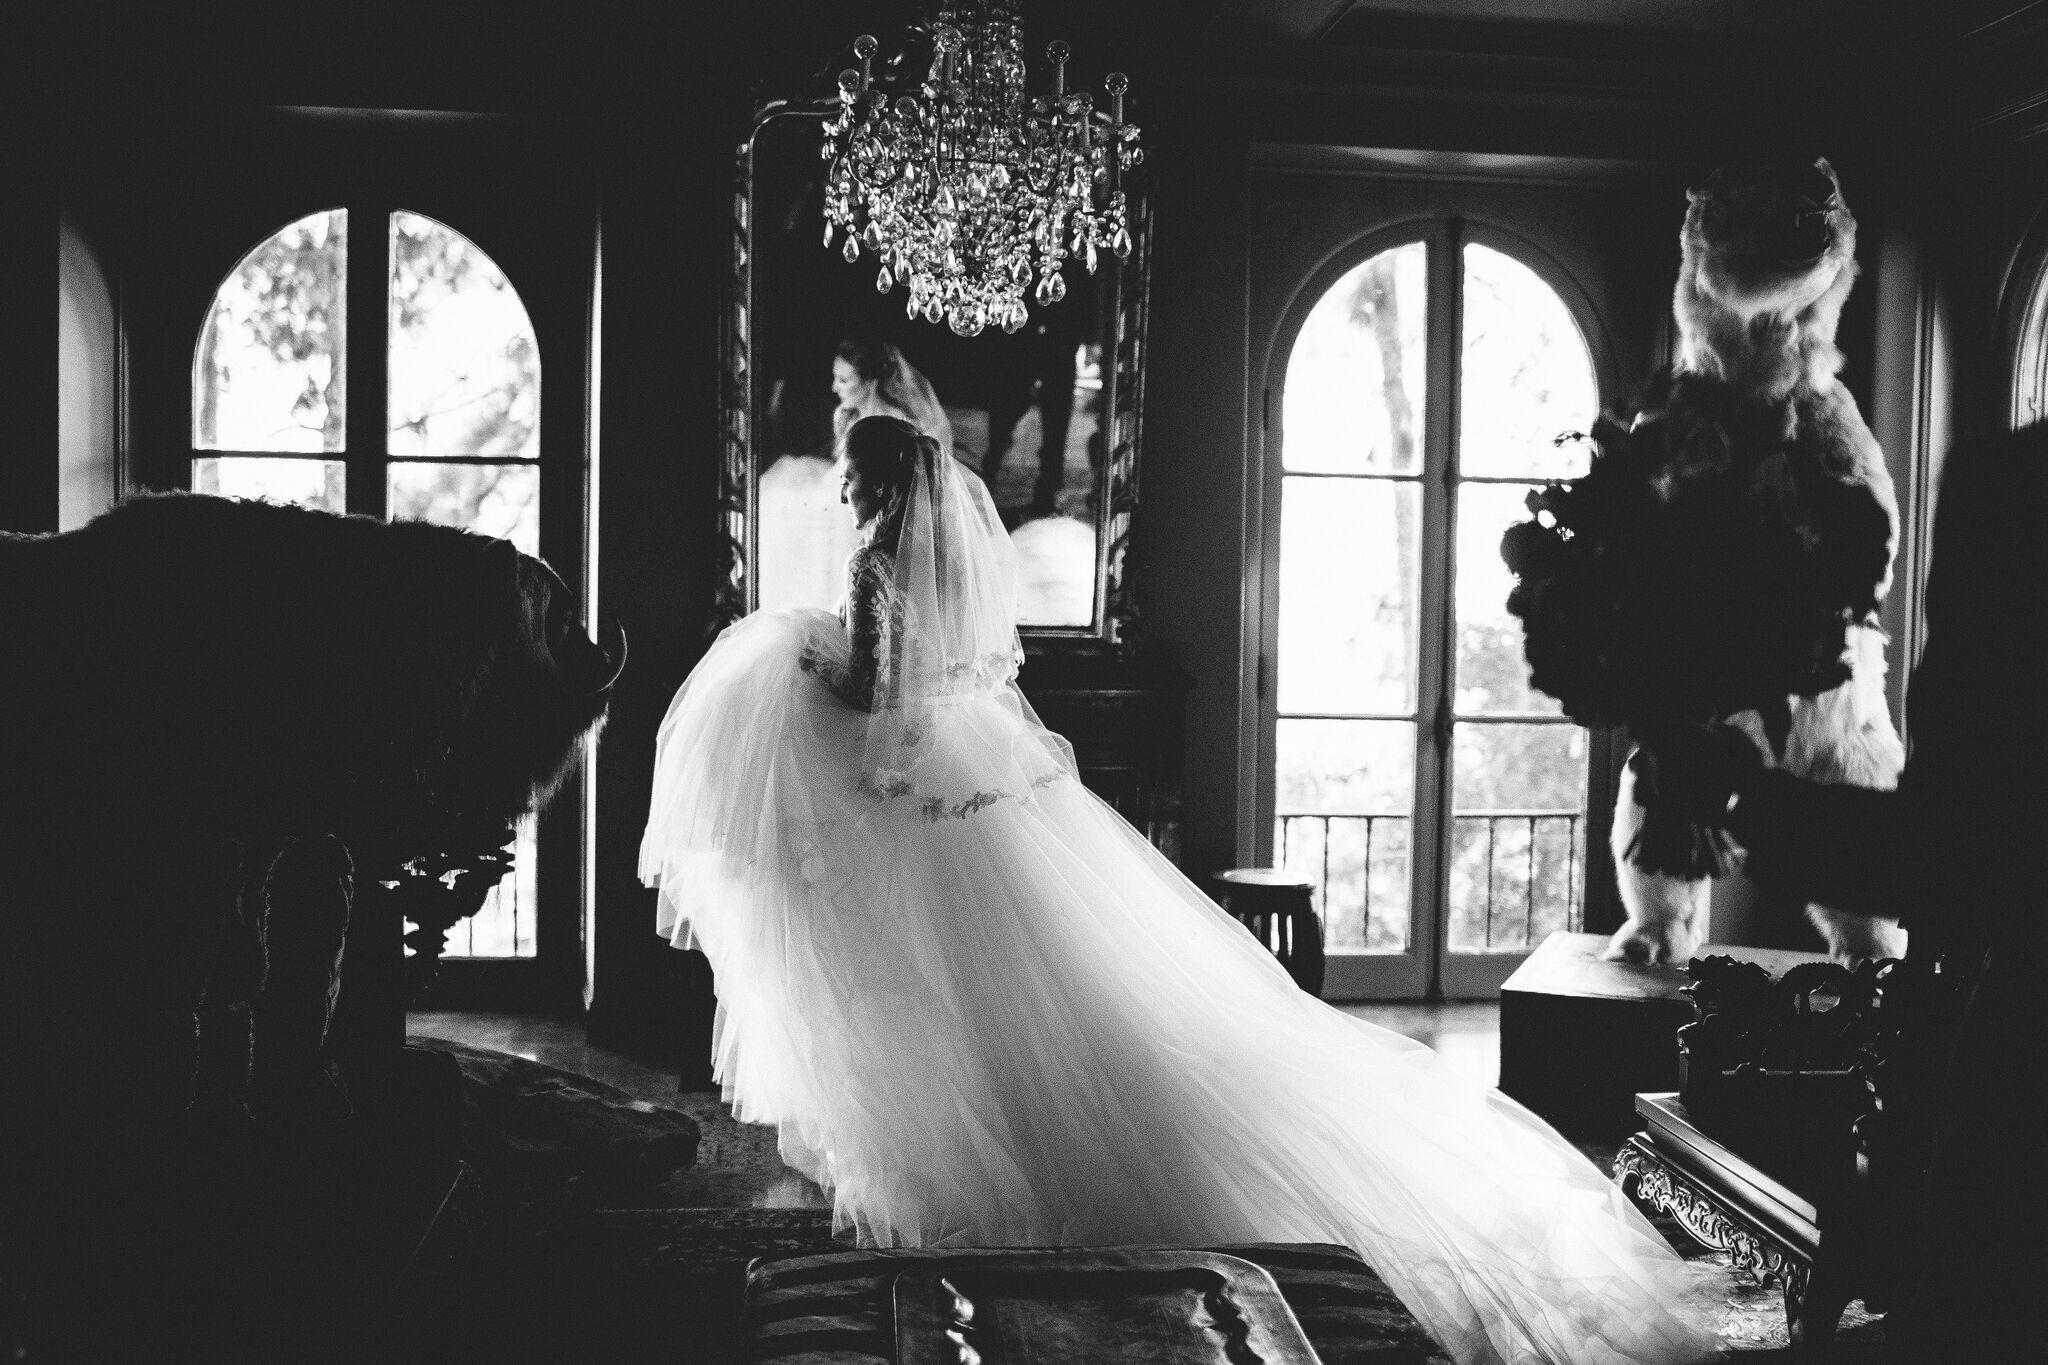 princess bride, megan markle wedding dress, princess wedding day looks, rosa clara wedding gown